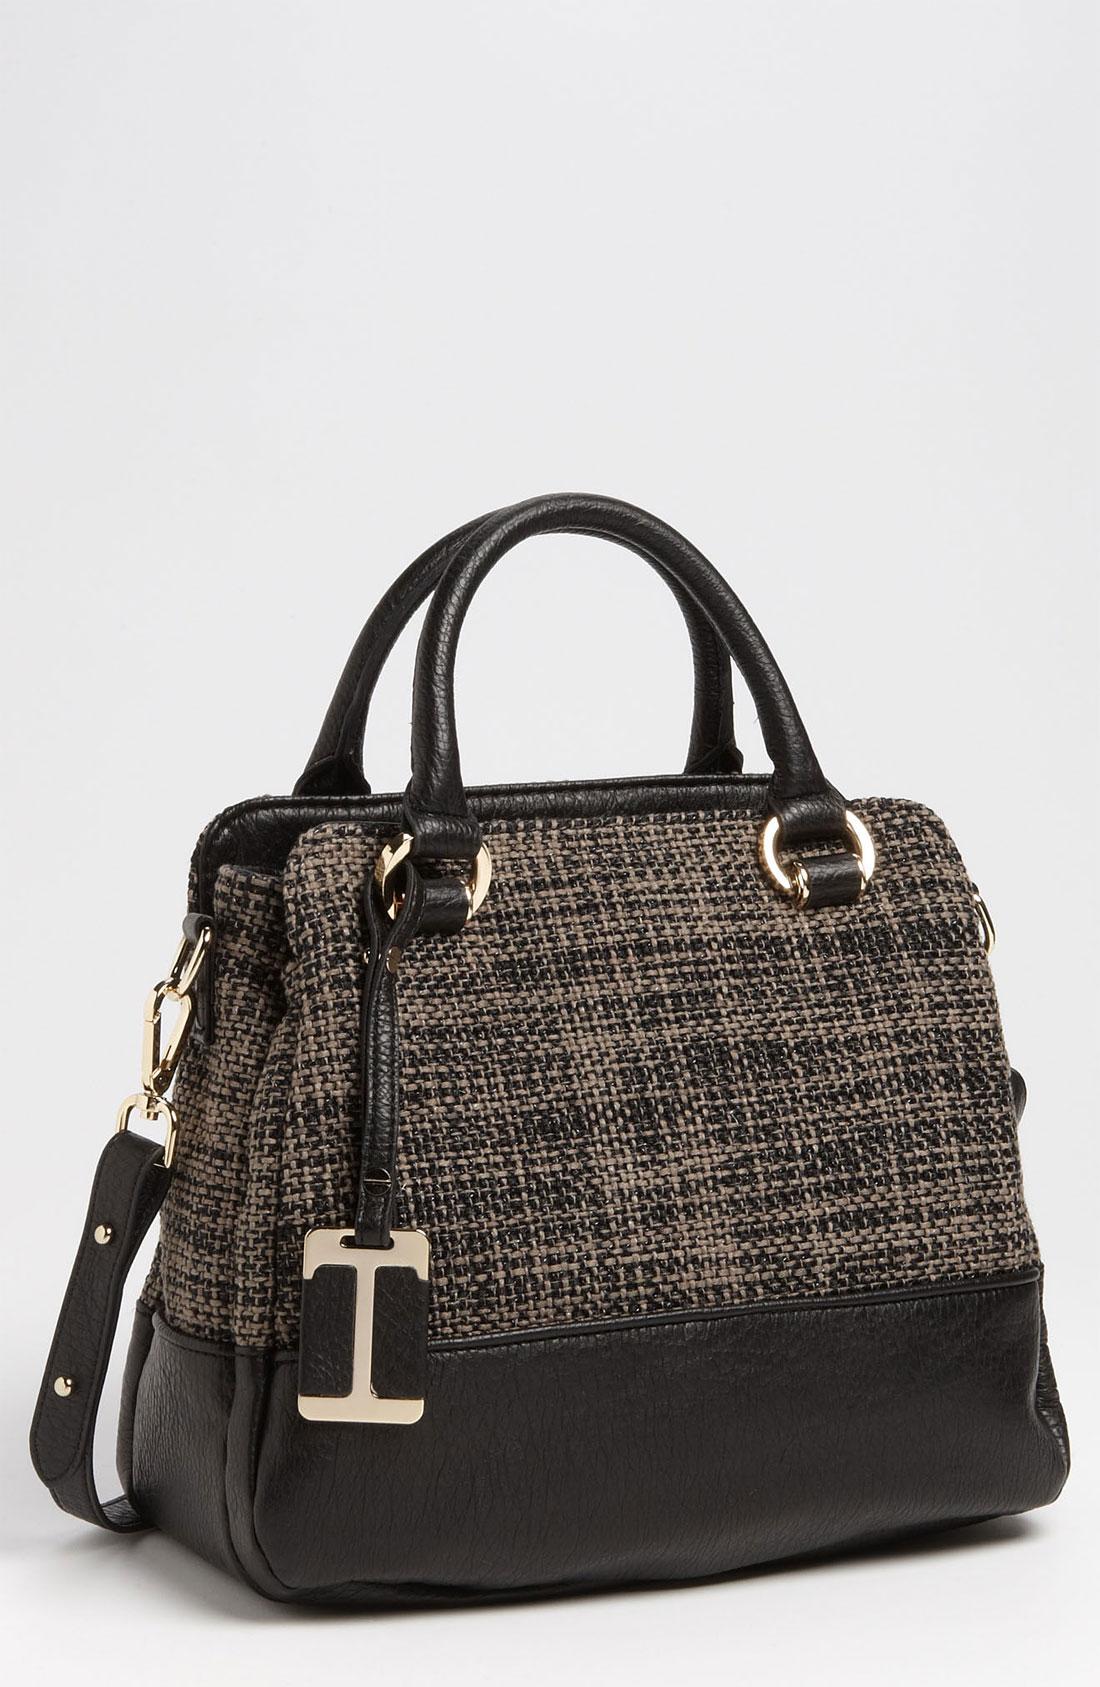 ivanka trump handbags satchel